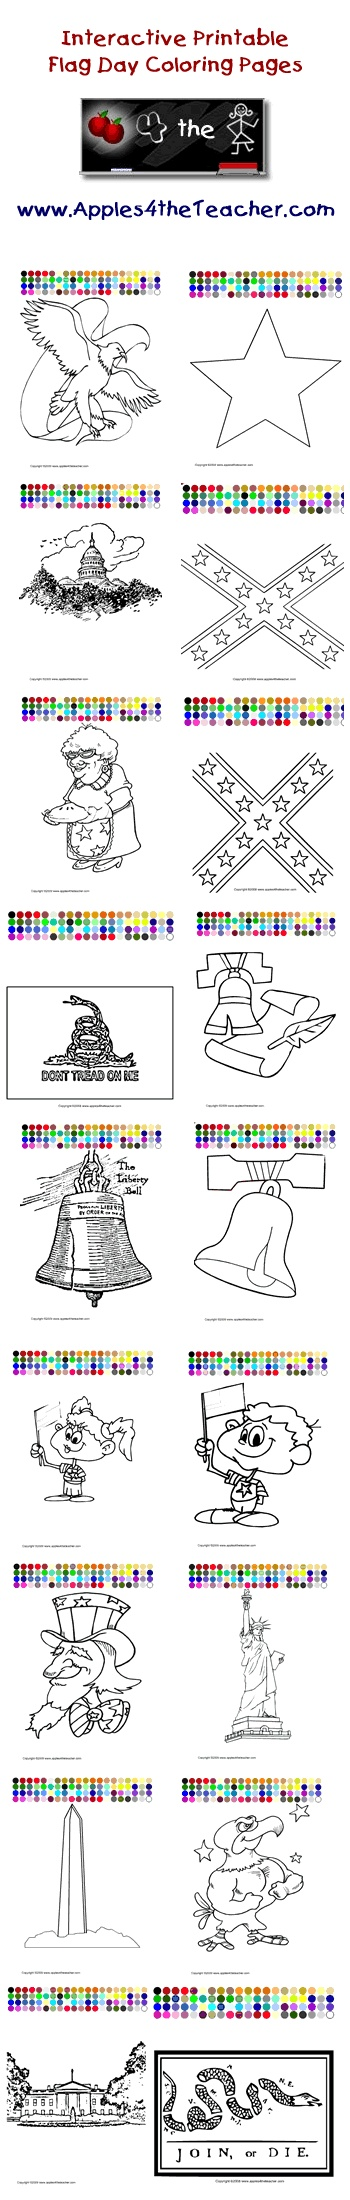 17 best 6th Grade Spelling images on Pinterest | Alphabetical order ...